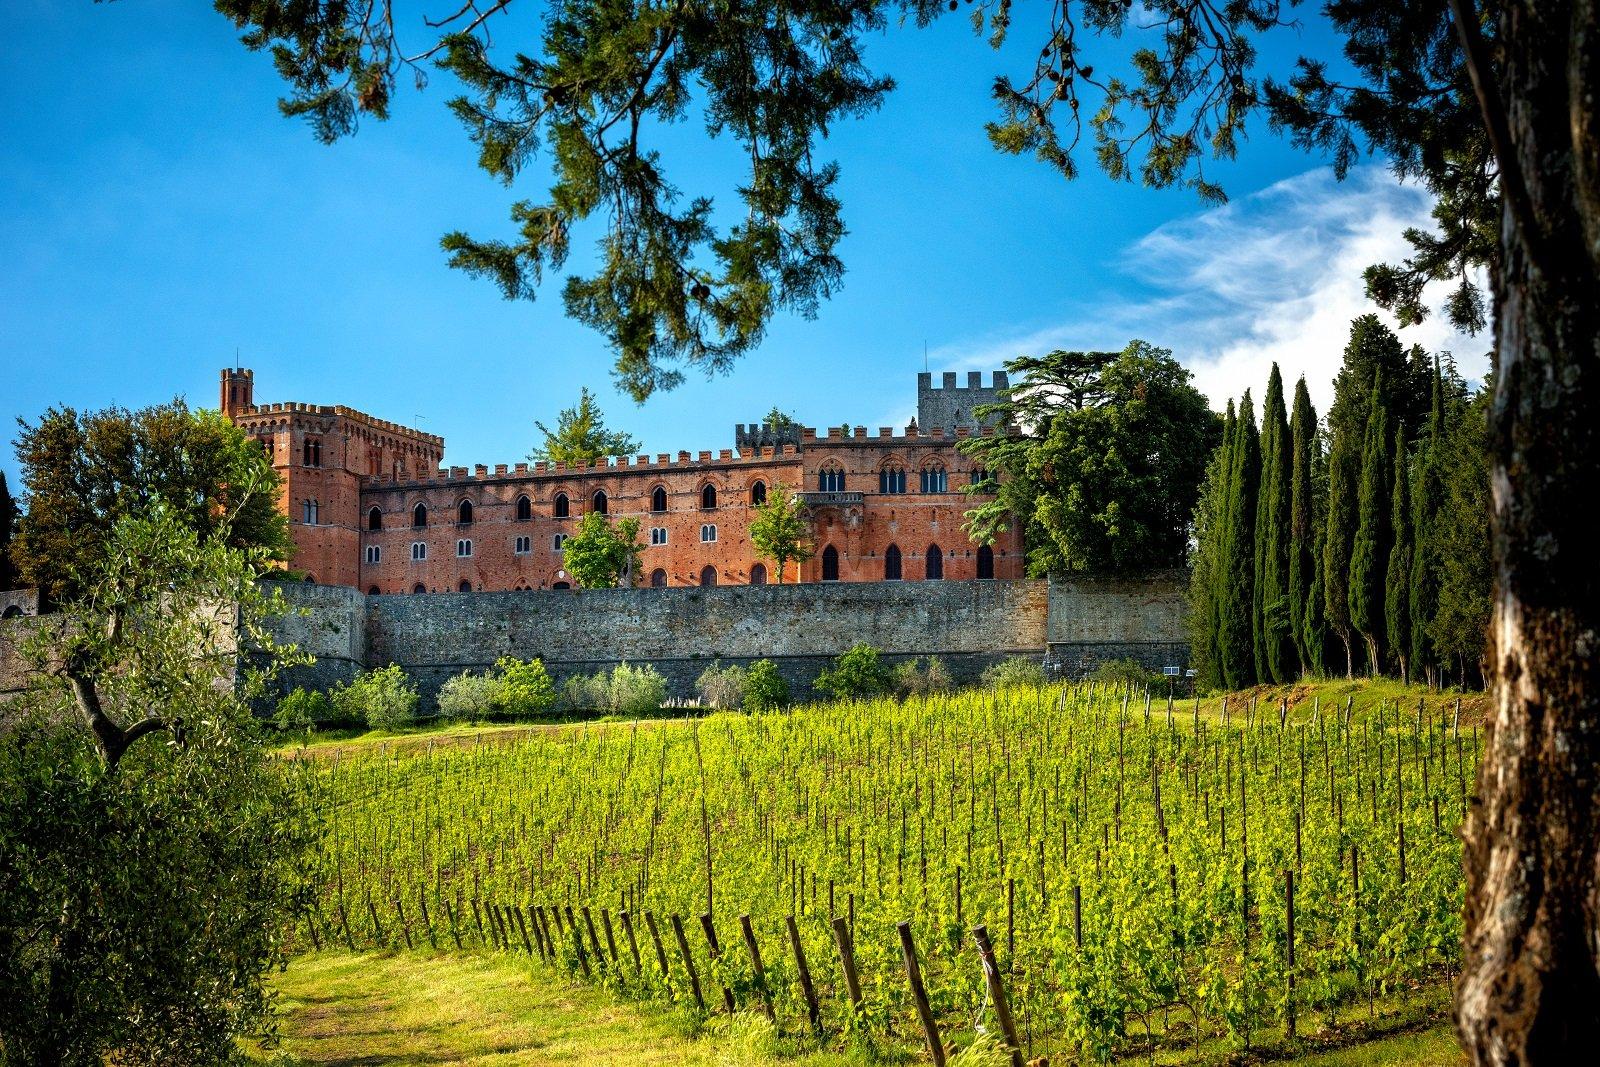 San Gimignano Chianti Siena Monteriggioni Tour From Montecatini